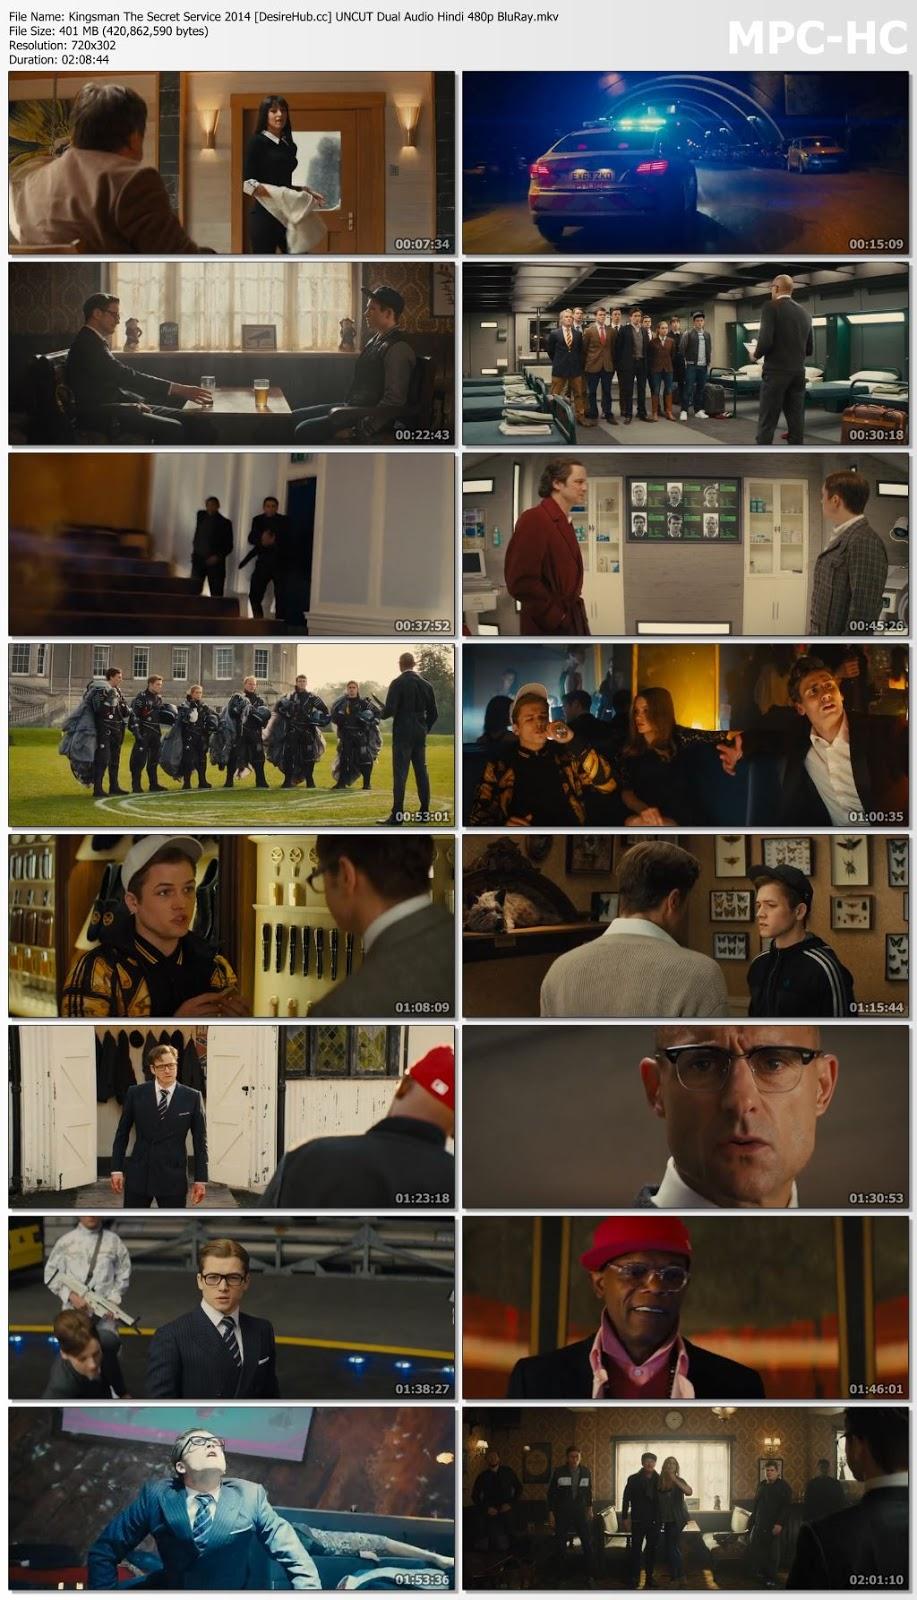 Kingsman The Secret Service 2014 UNCUT Dual Audio Hindi 480p BluRay 400MB Desirehub